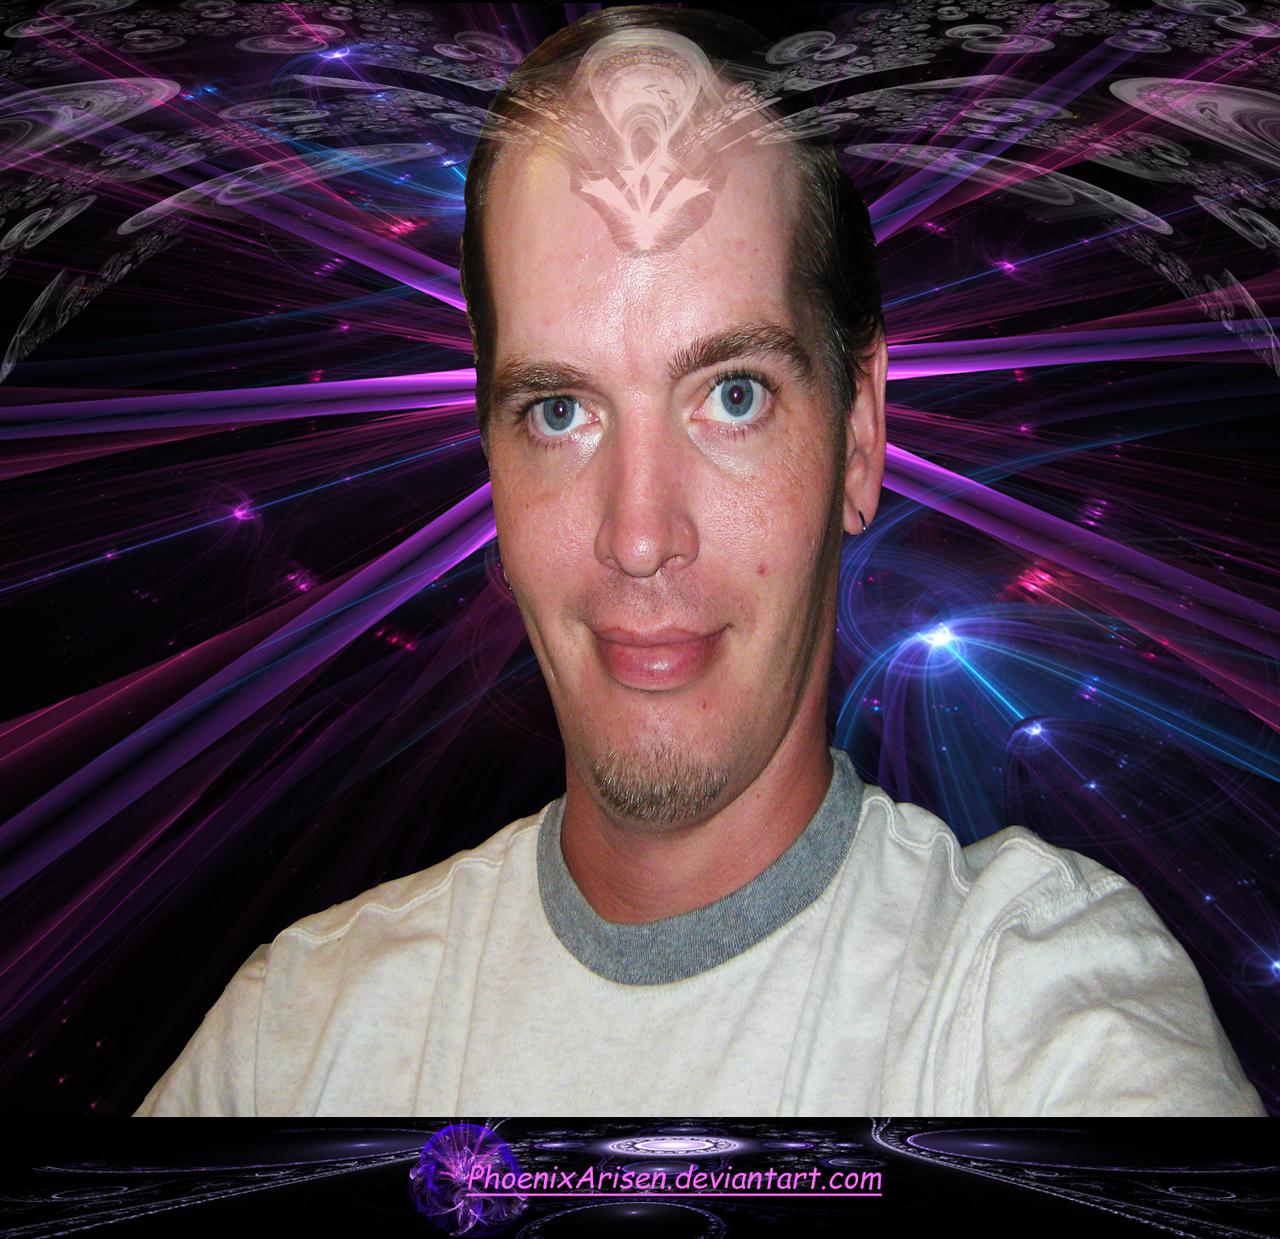 PhoenixArisen's Profile Picture